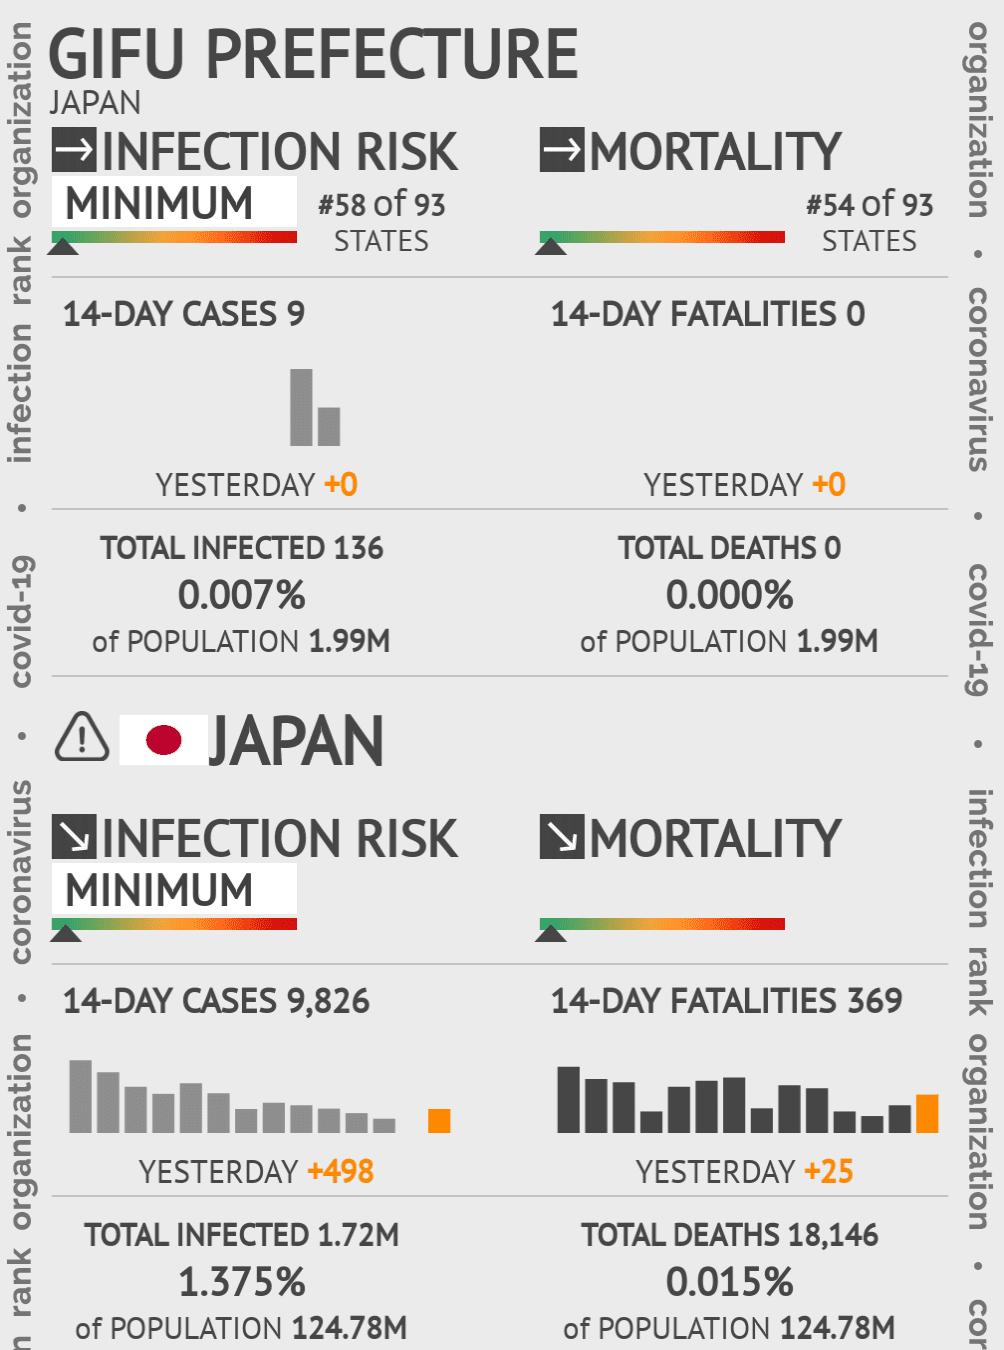 Gifu Prefecture Coronavirus Covid-19 Risk of Infection on May 14, 2020